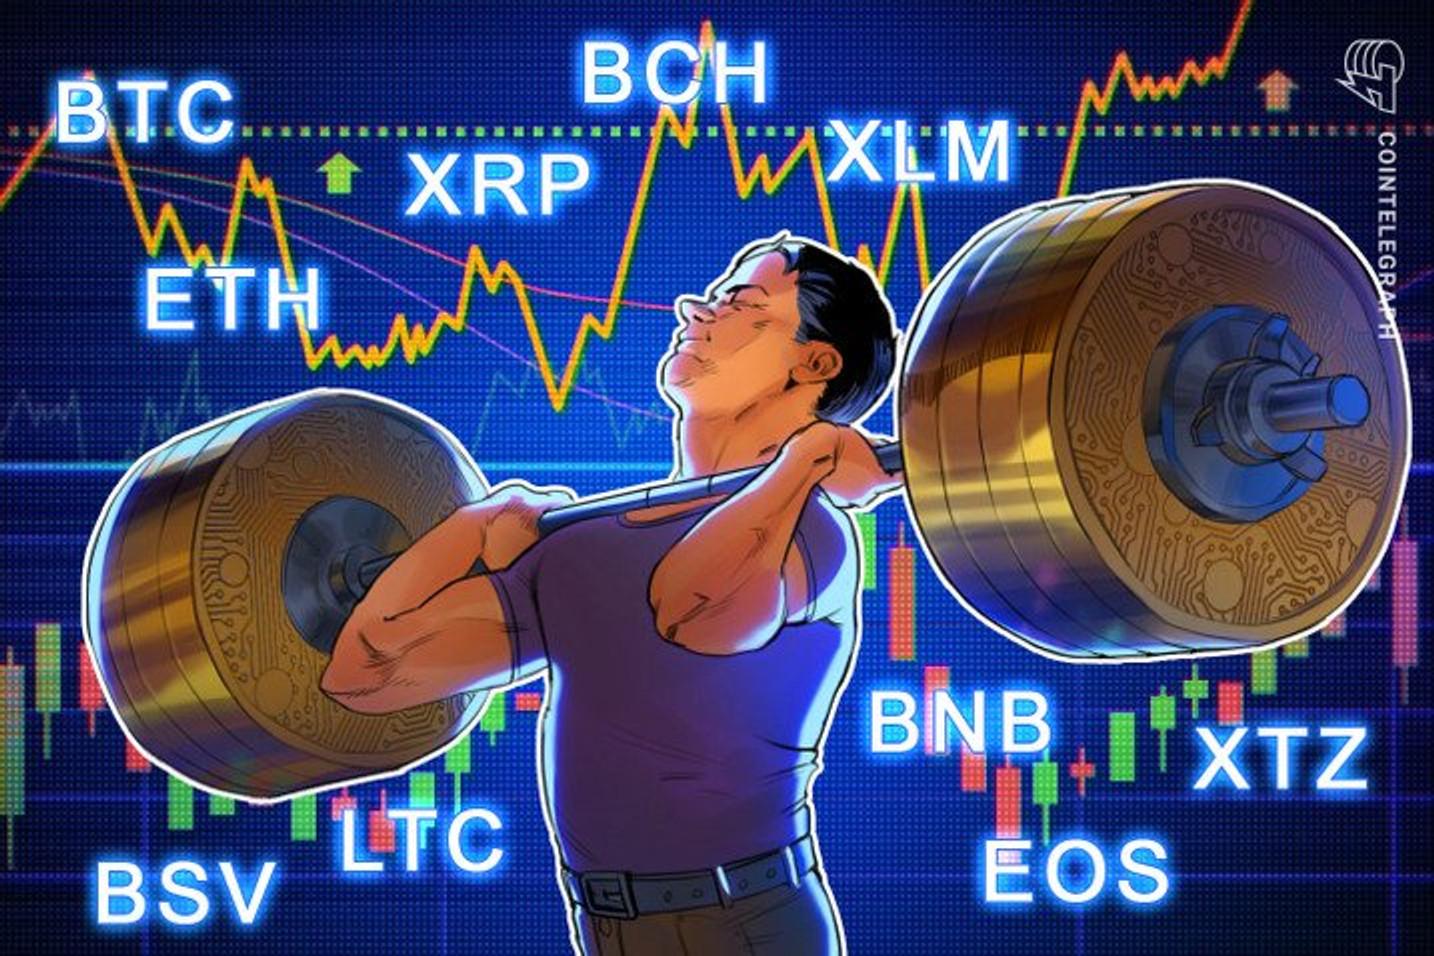 'Altcoins devem derrubar a dominância do Bitcoin depois do halving', diz analista Zack Voell